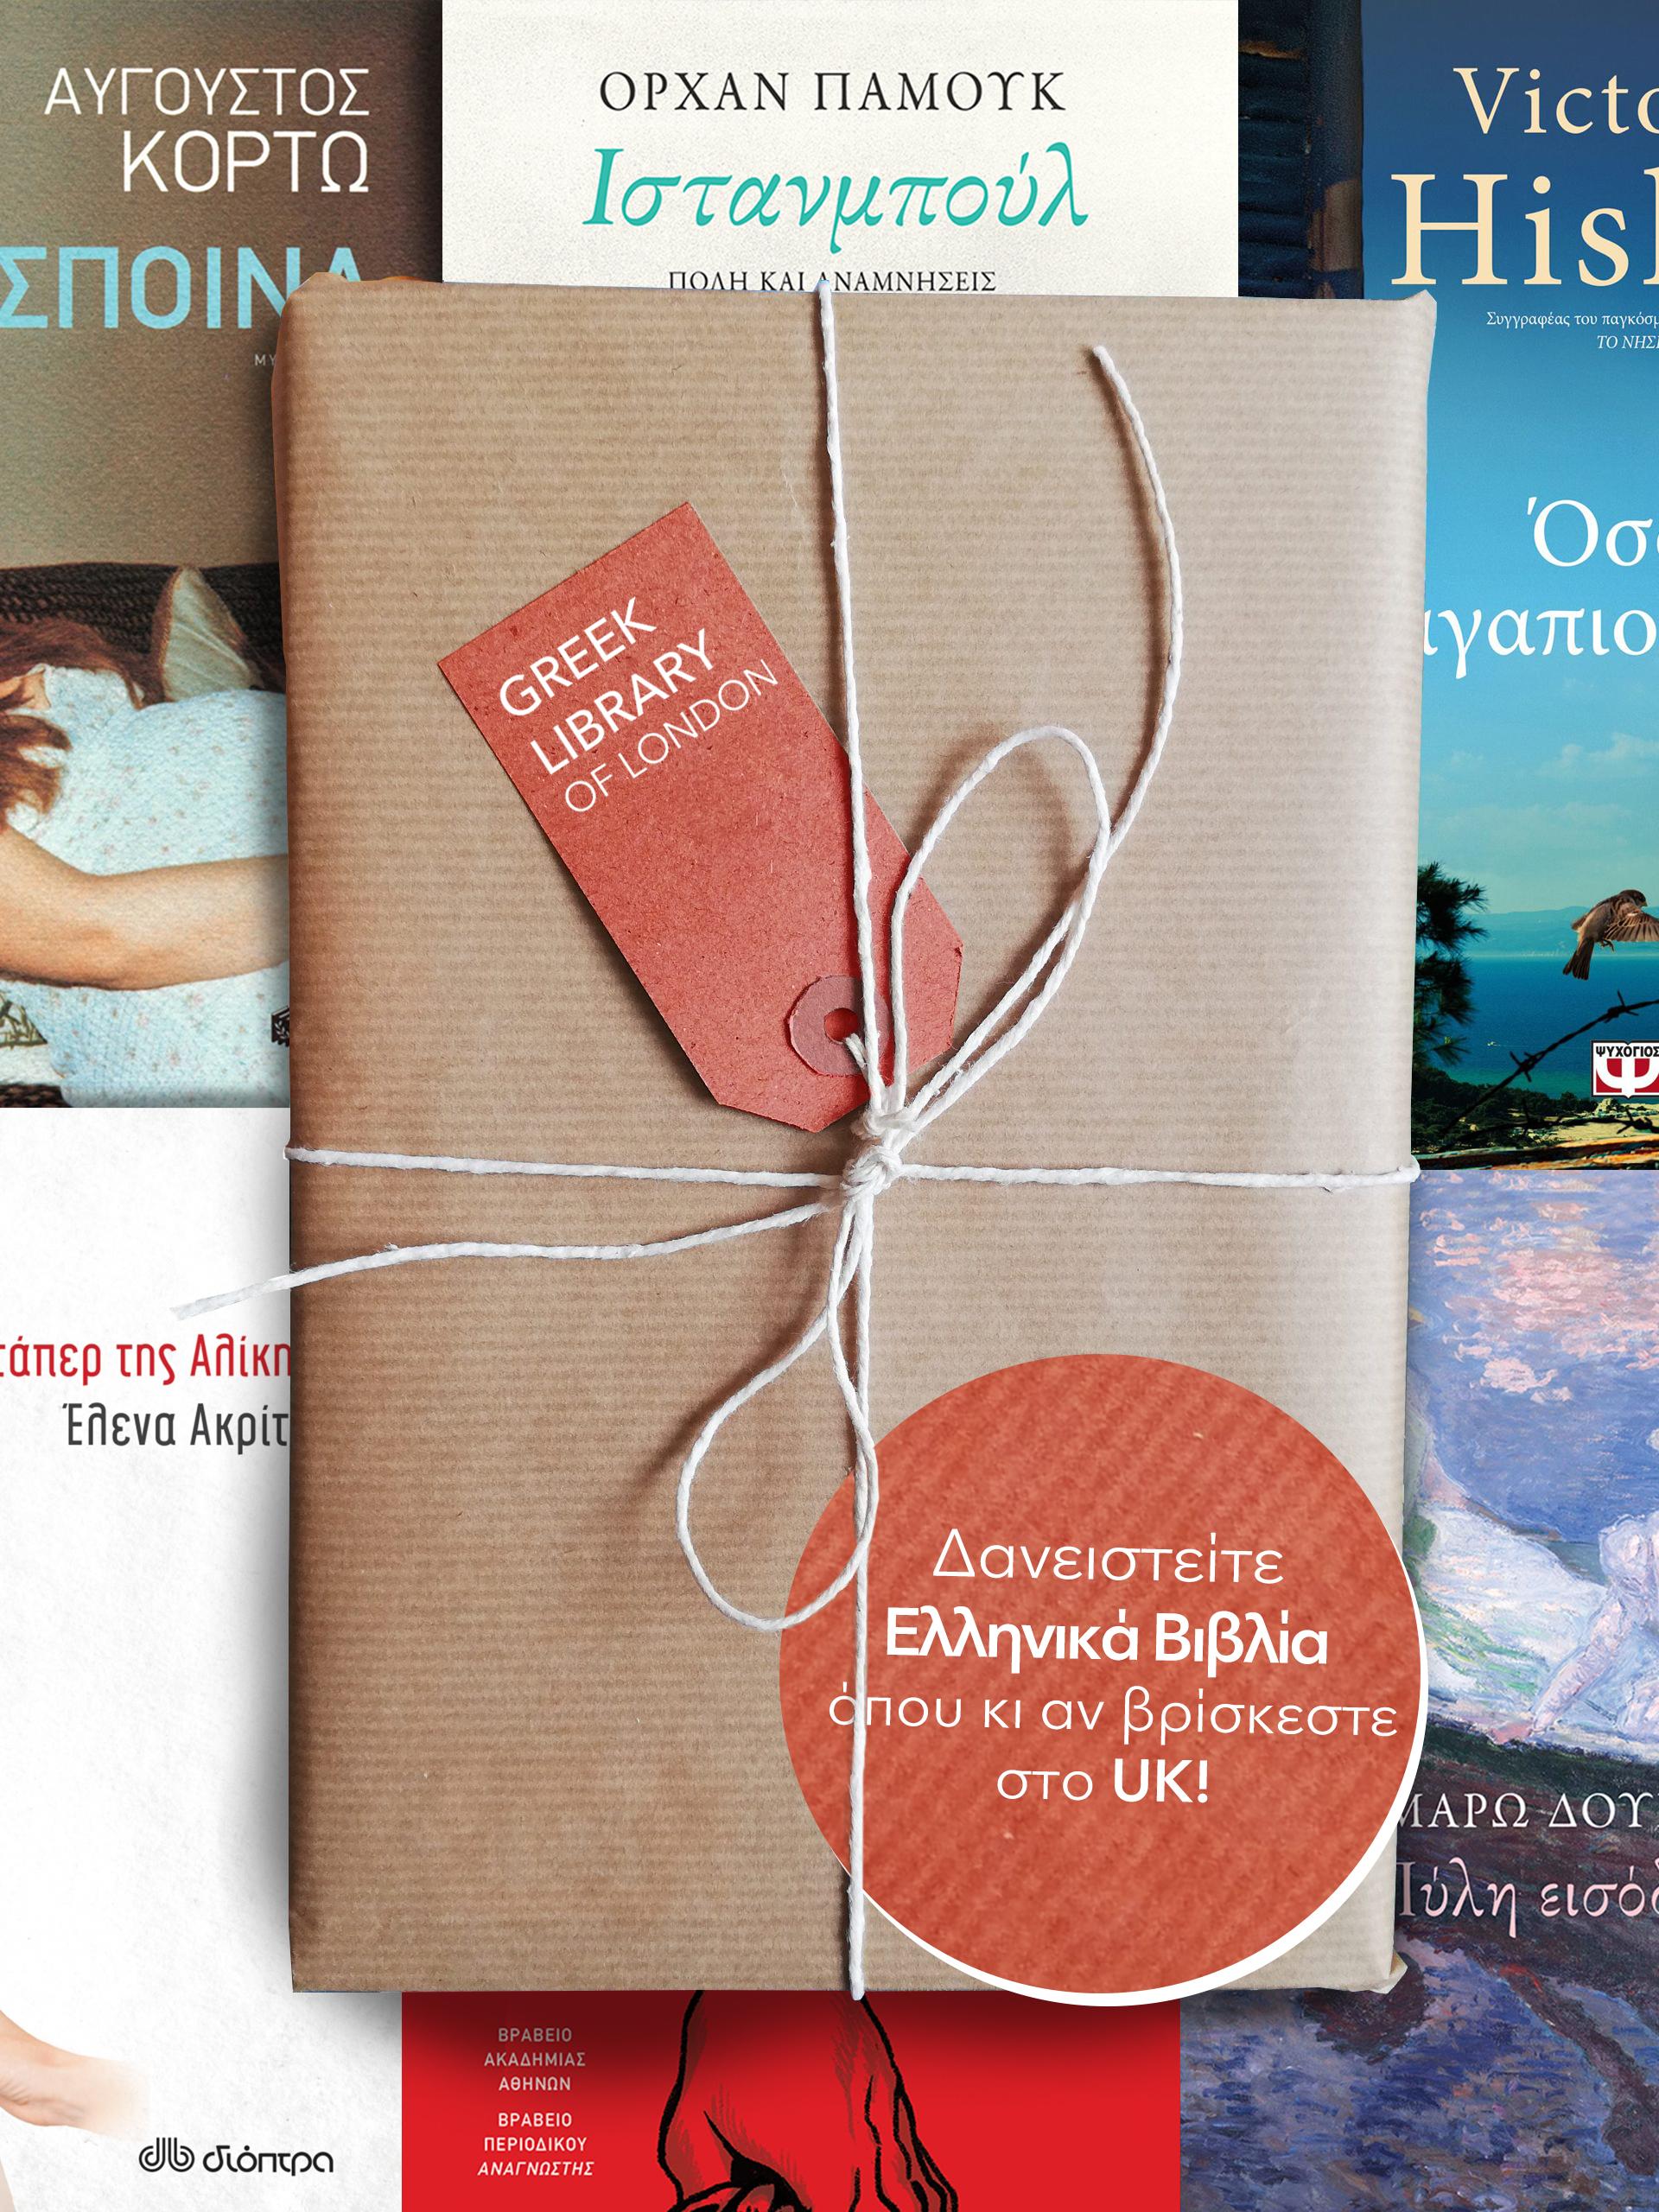 Greek books throughout the U.K.